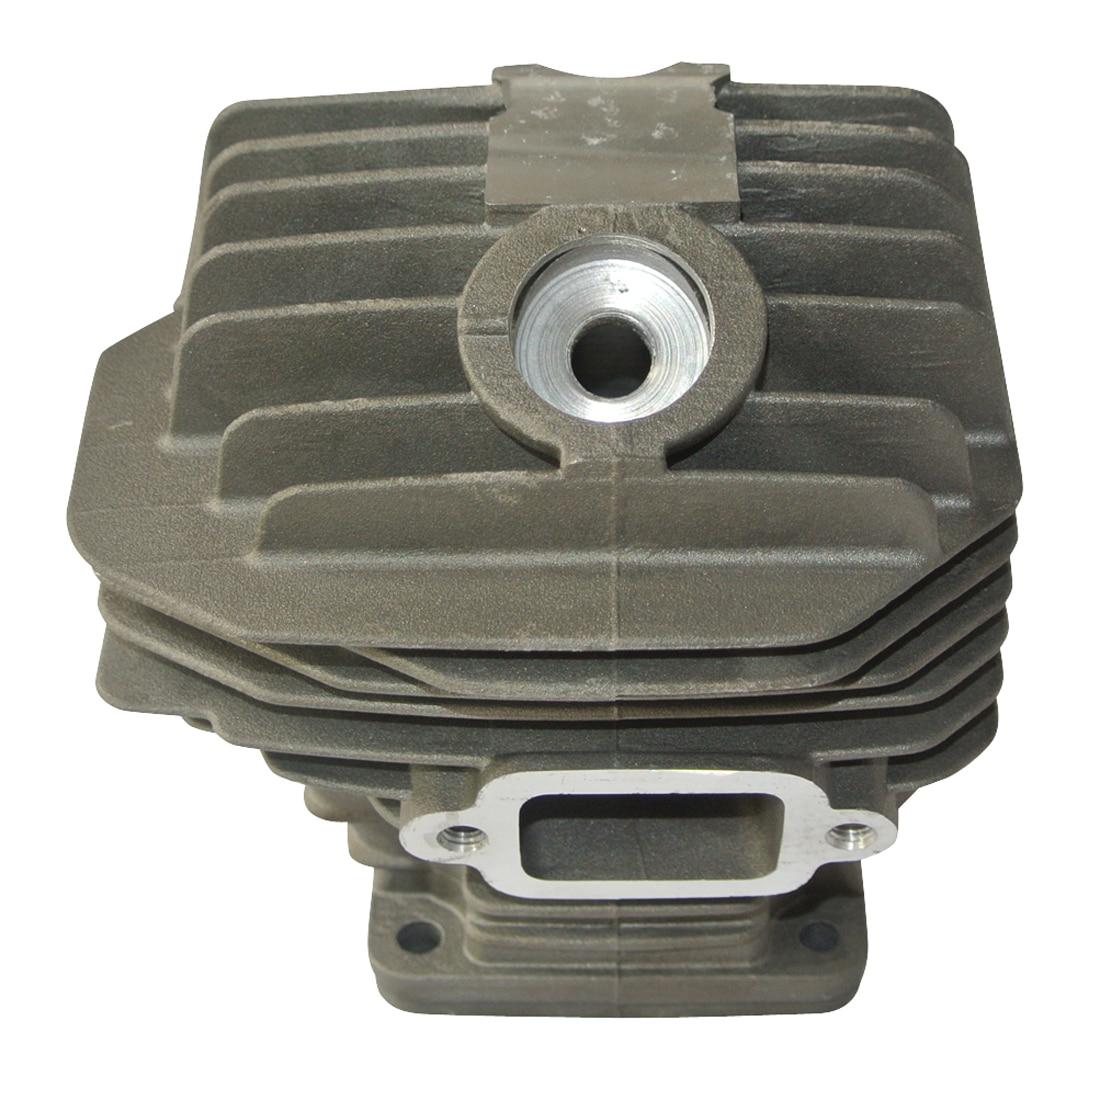 Tools : Nikasil 50MM Cylinder Piston Ring Kit Fit STIHL 044 MS440 Chainsaw 1128-020-1226